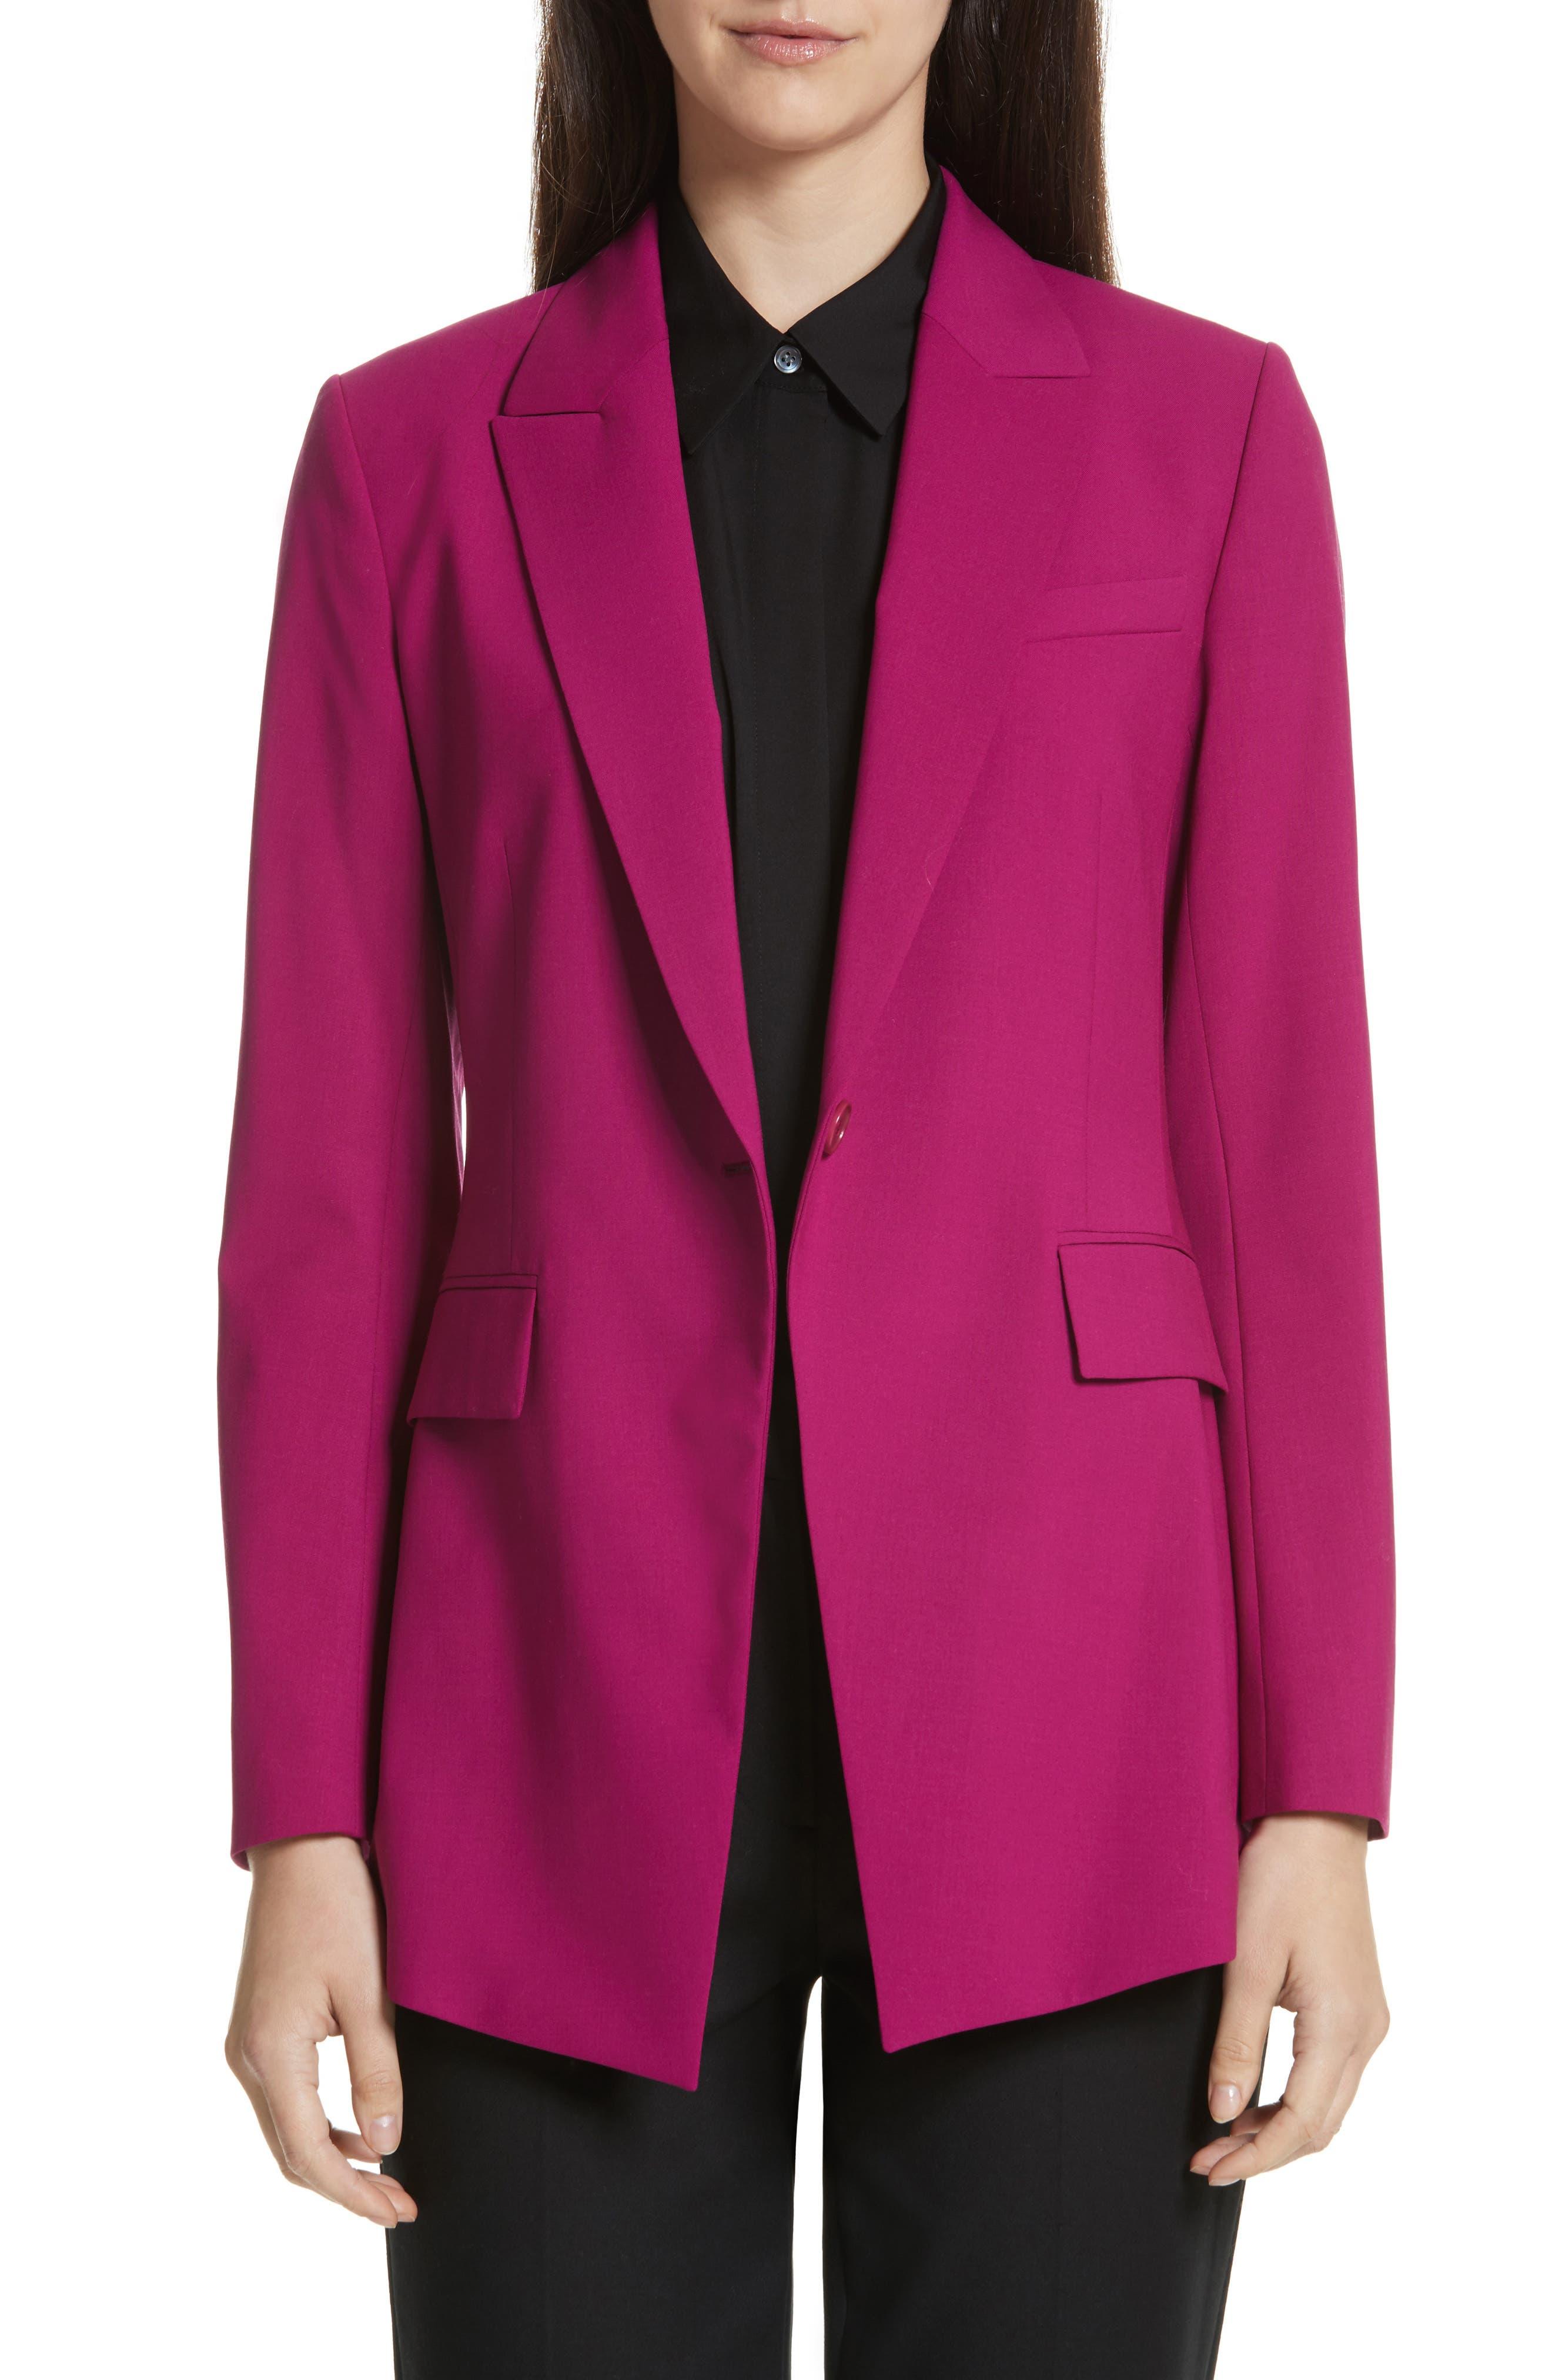 Etienette B Good Wool Suit Jacket,                         Main,                         color, Electric Pink